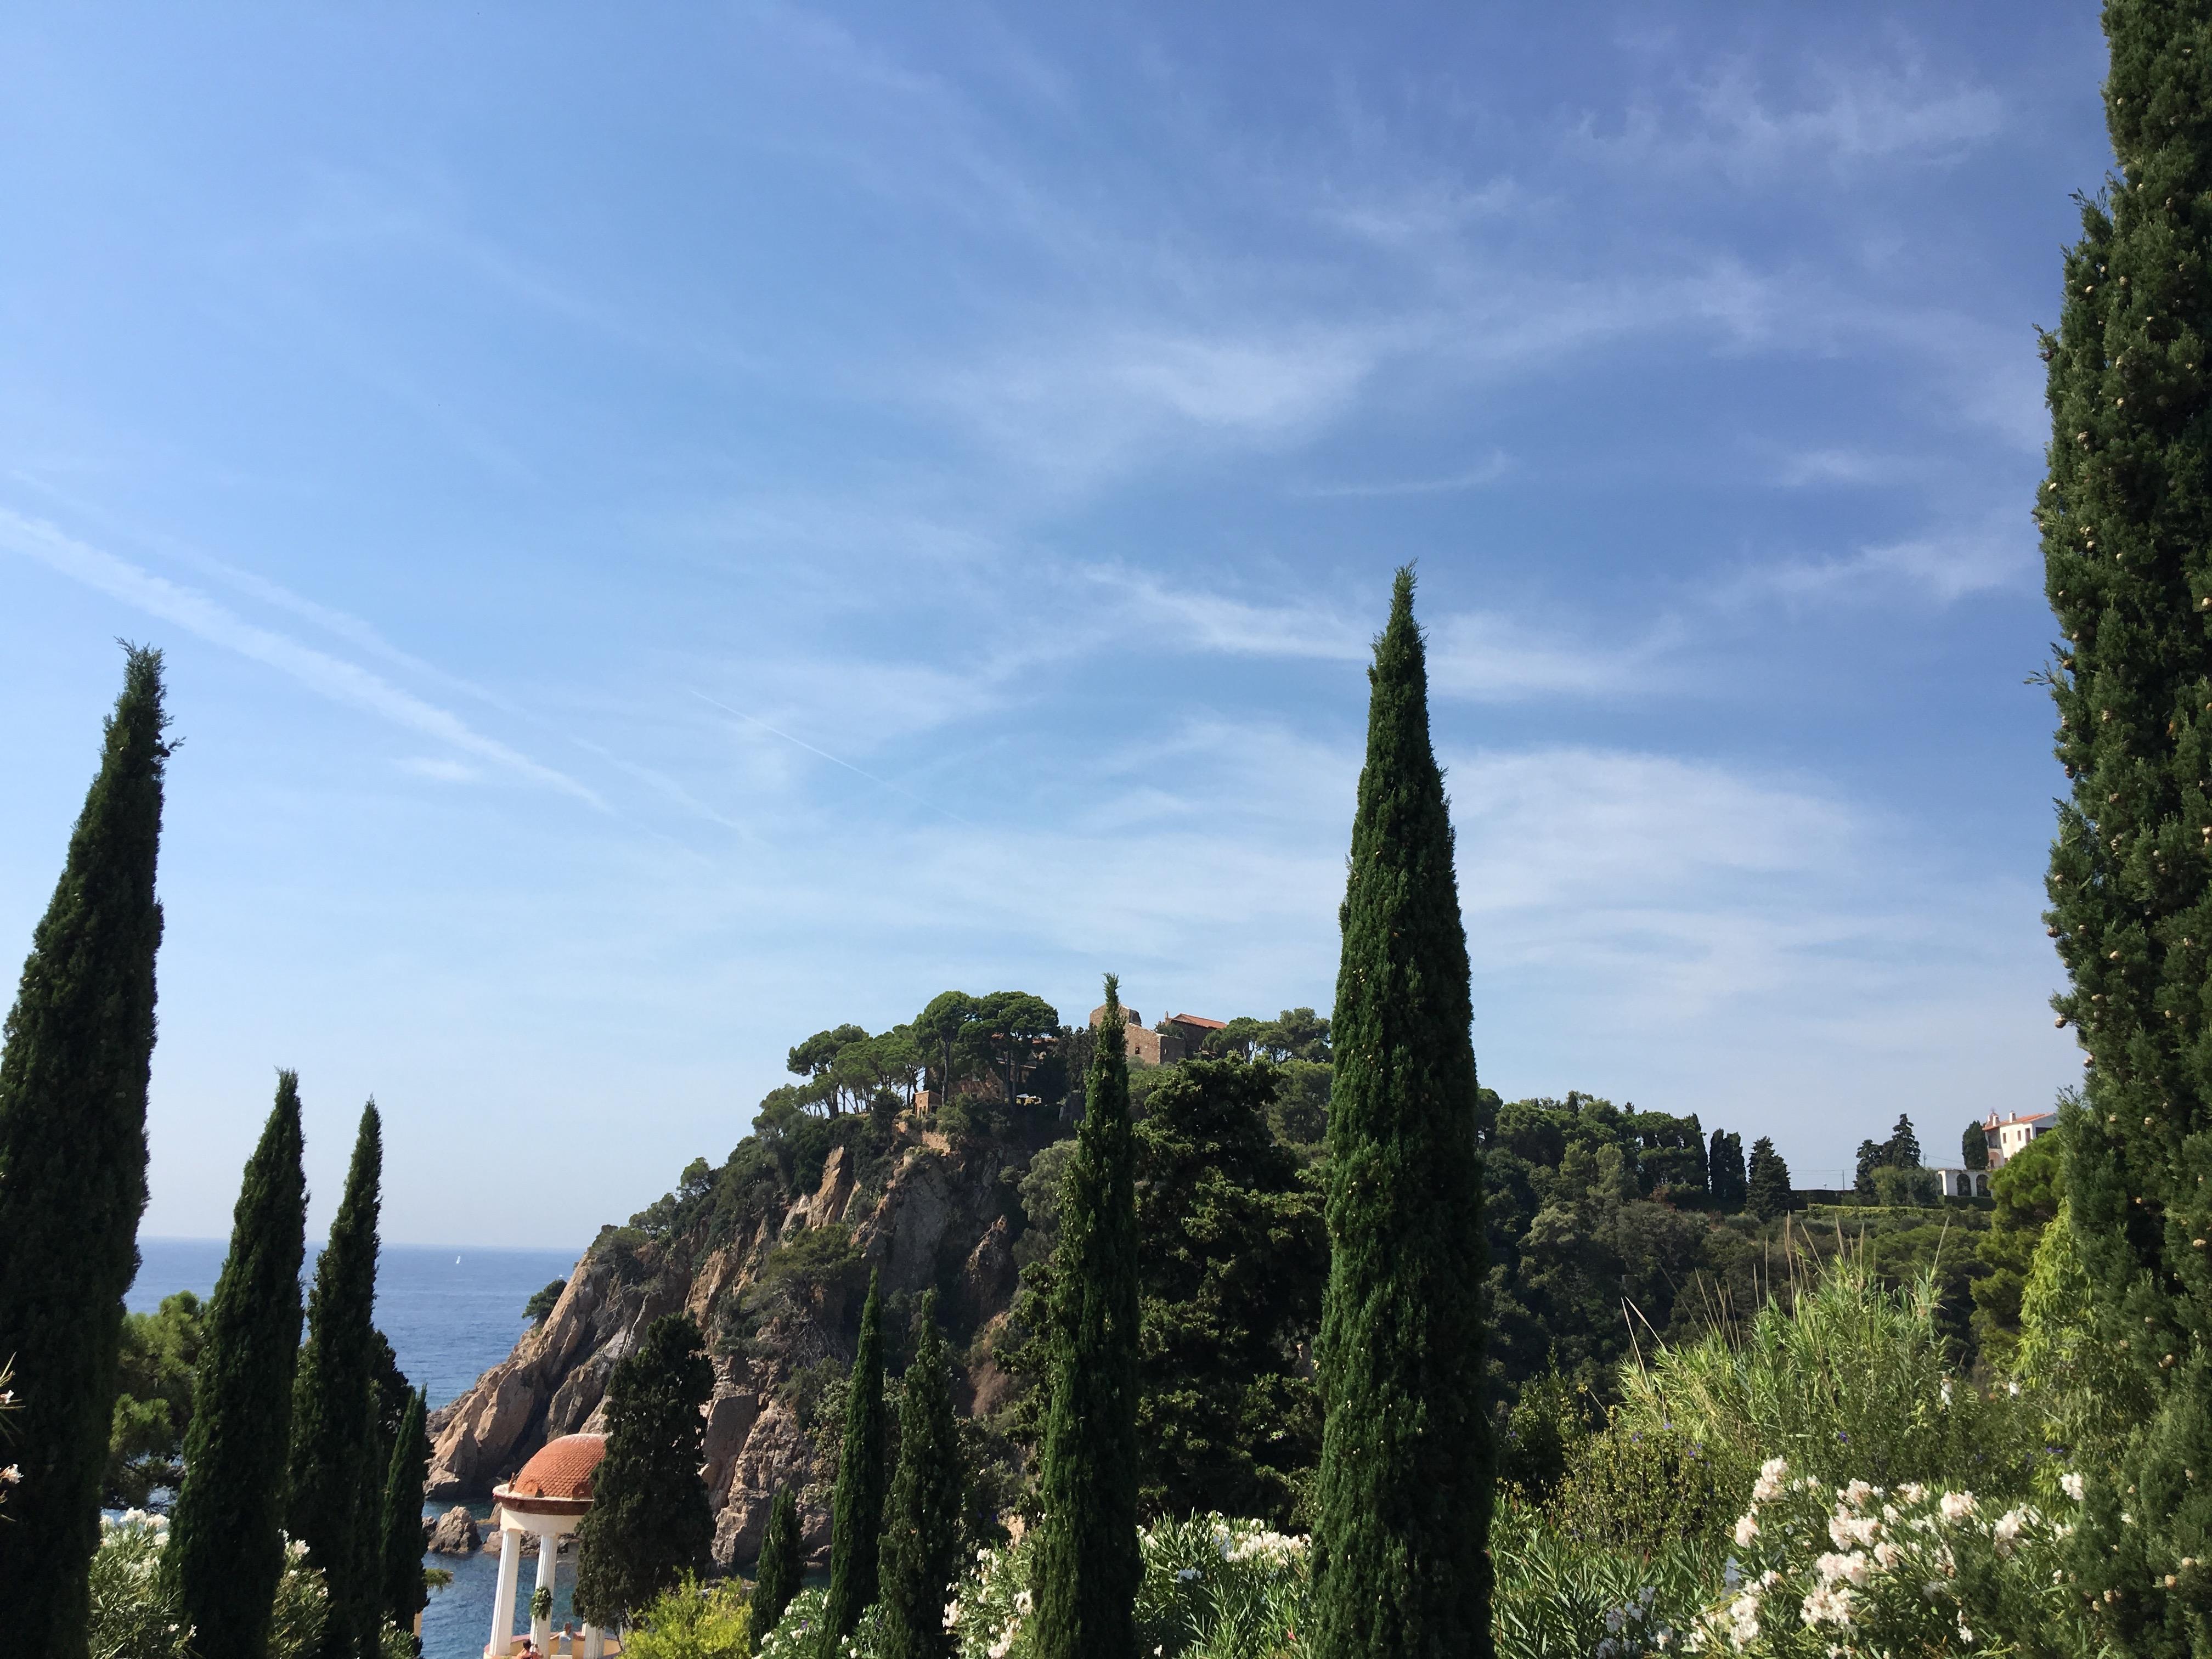 Costa brava jardins botaniques marimurtra botanical gardens - Perving Over Plans At Jardi Marimurtra